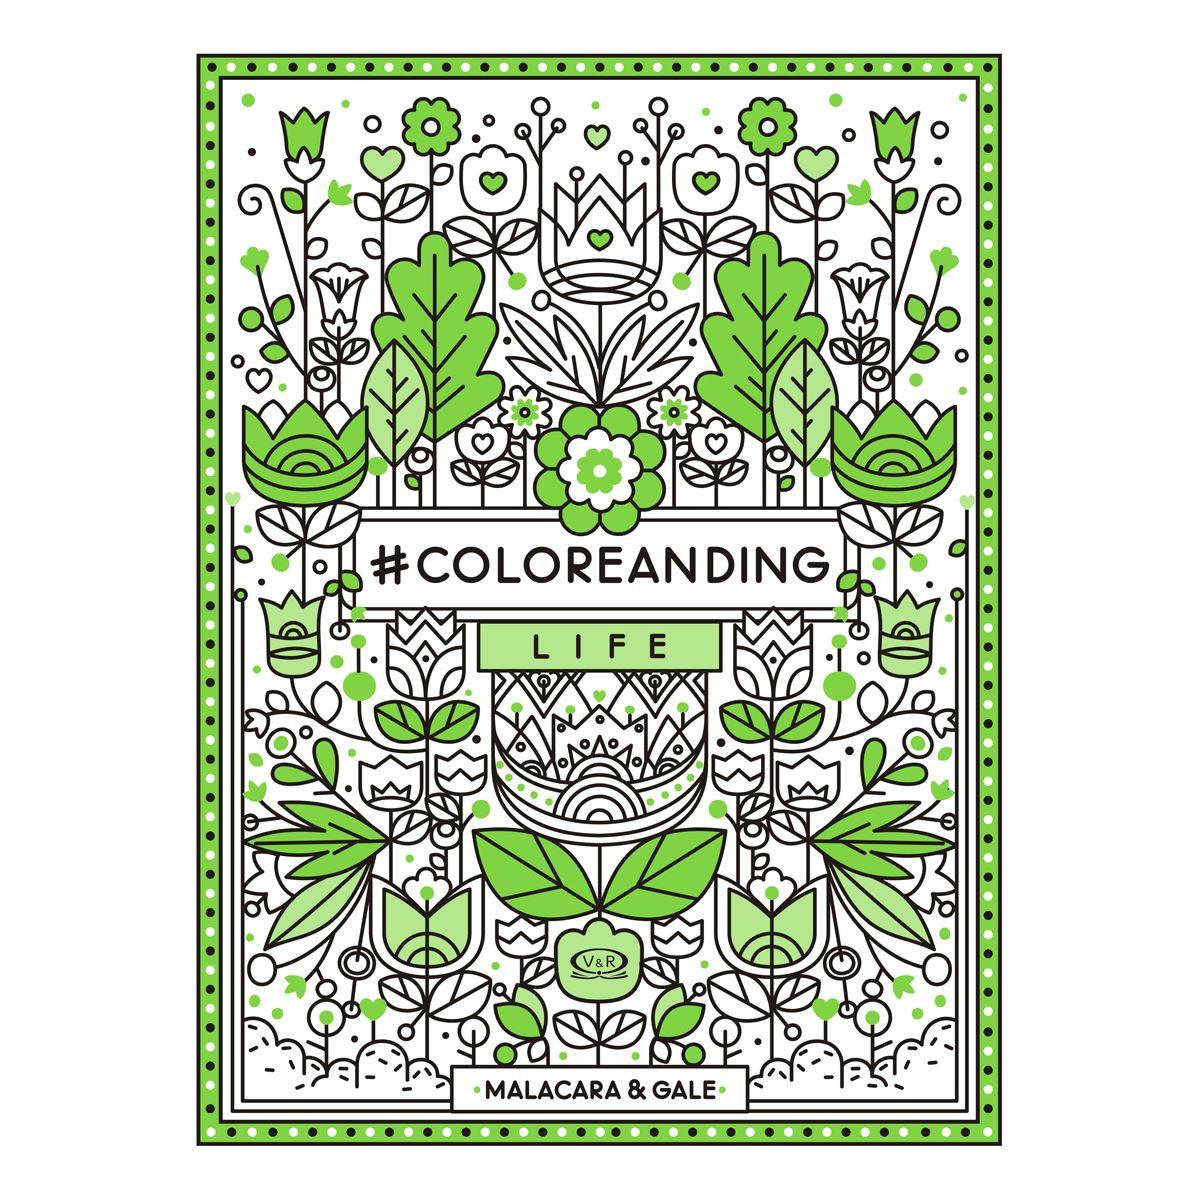 Life #Coloreanding